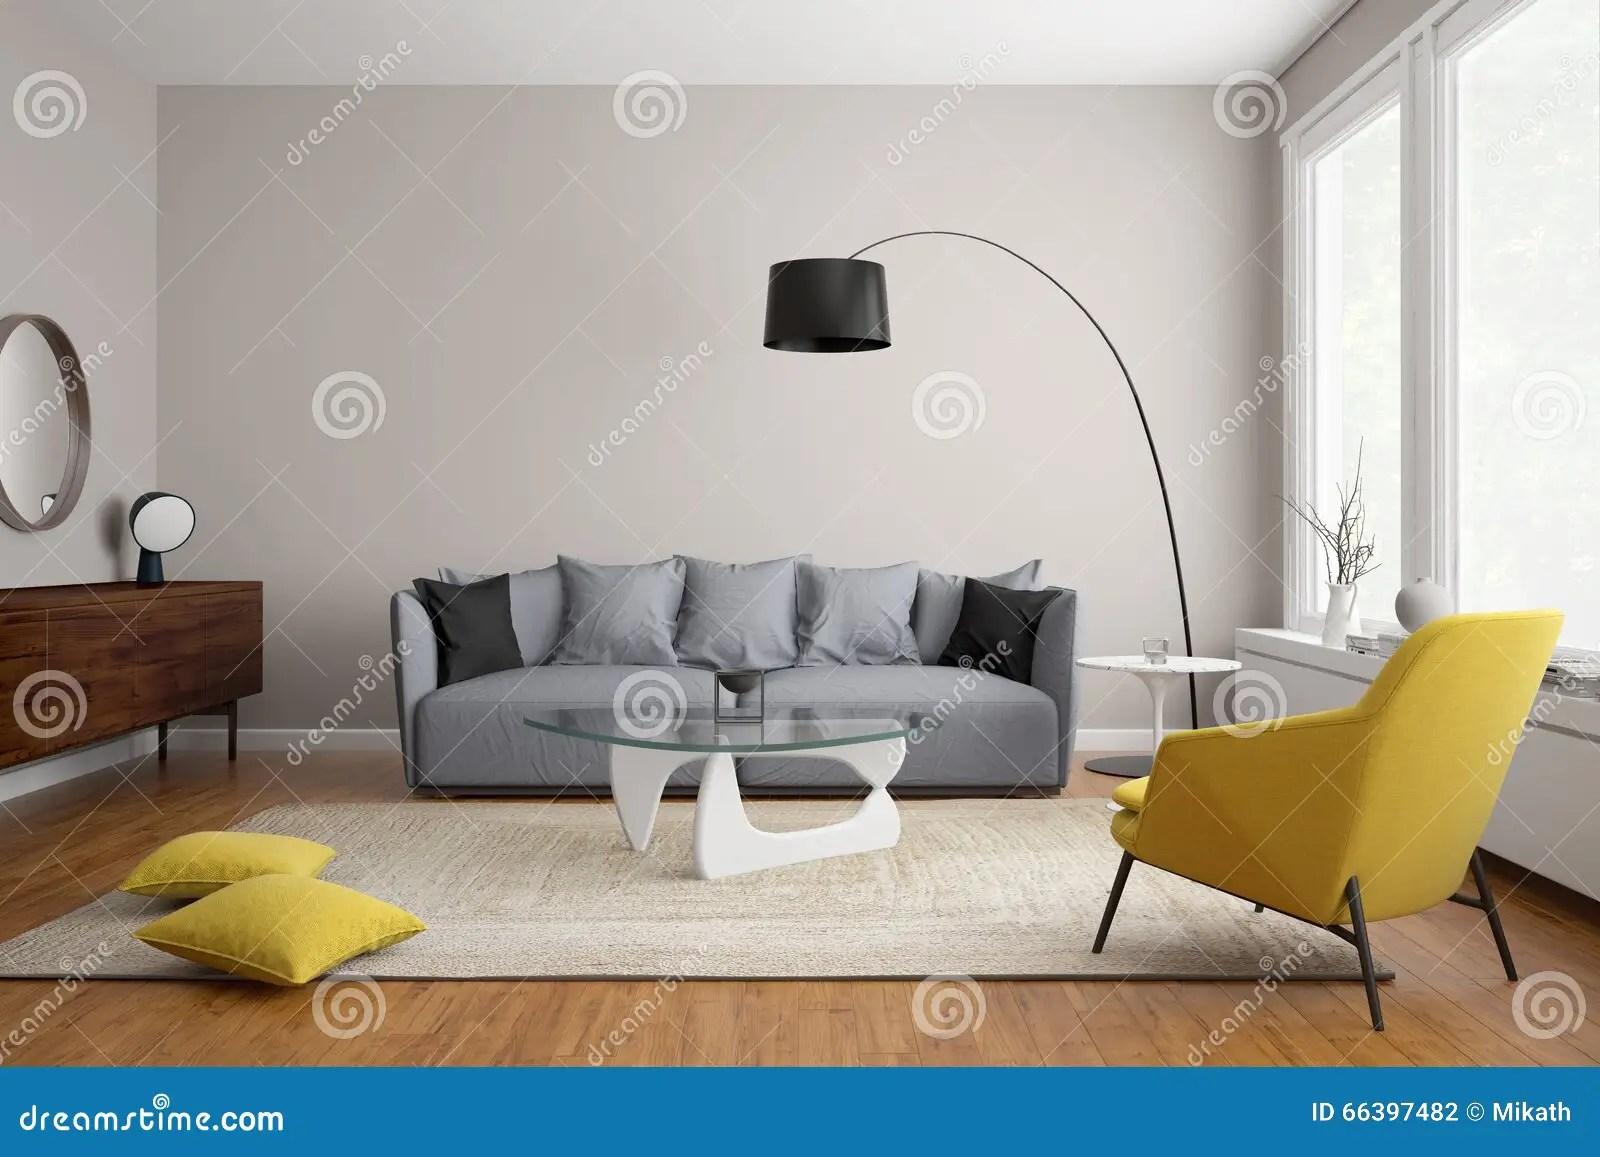 living rooms with grey sofas blue room modern scandinavian sofa stock illustration